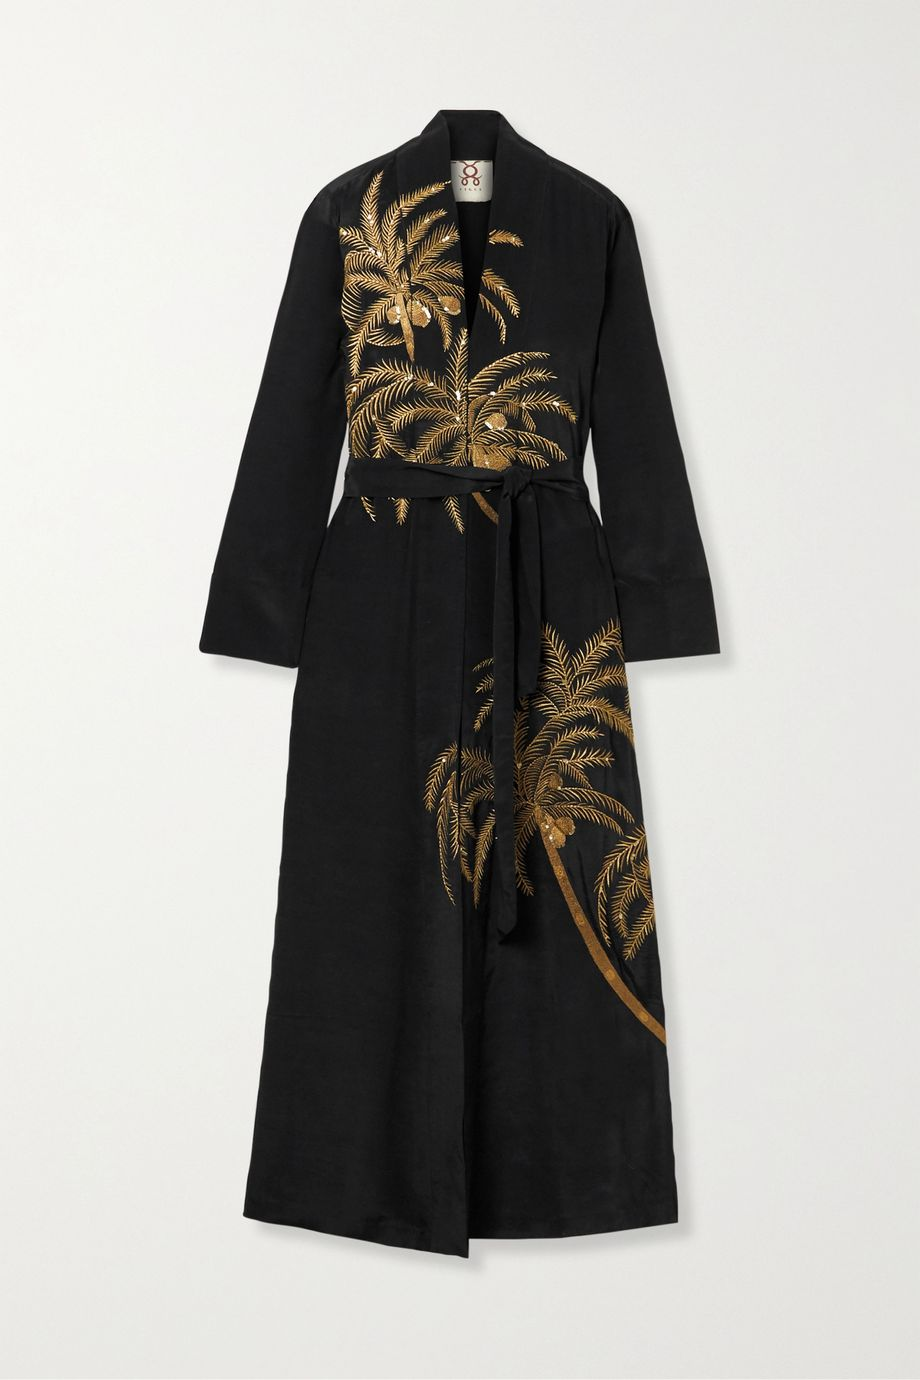 Figue Olatz embellished embroidered crepe de chine kimono